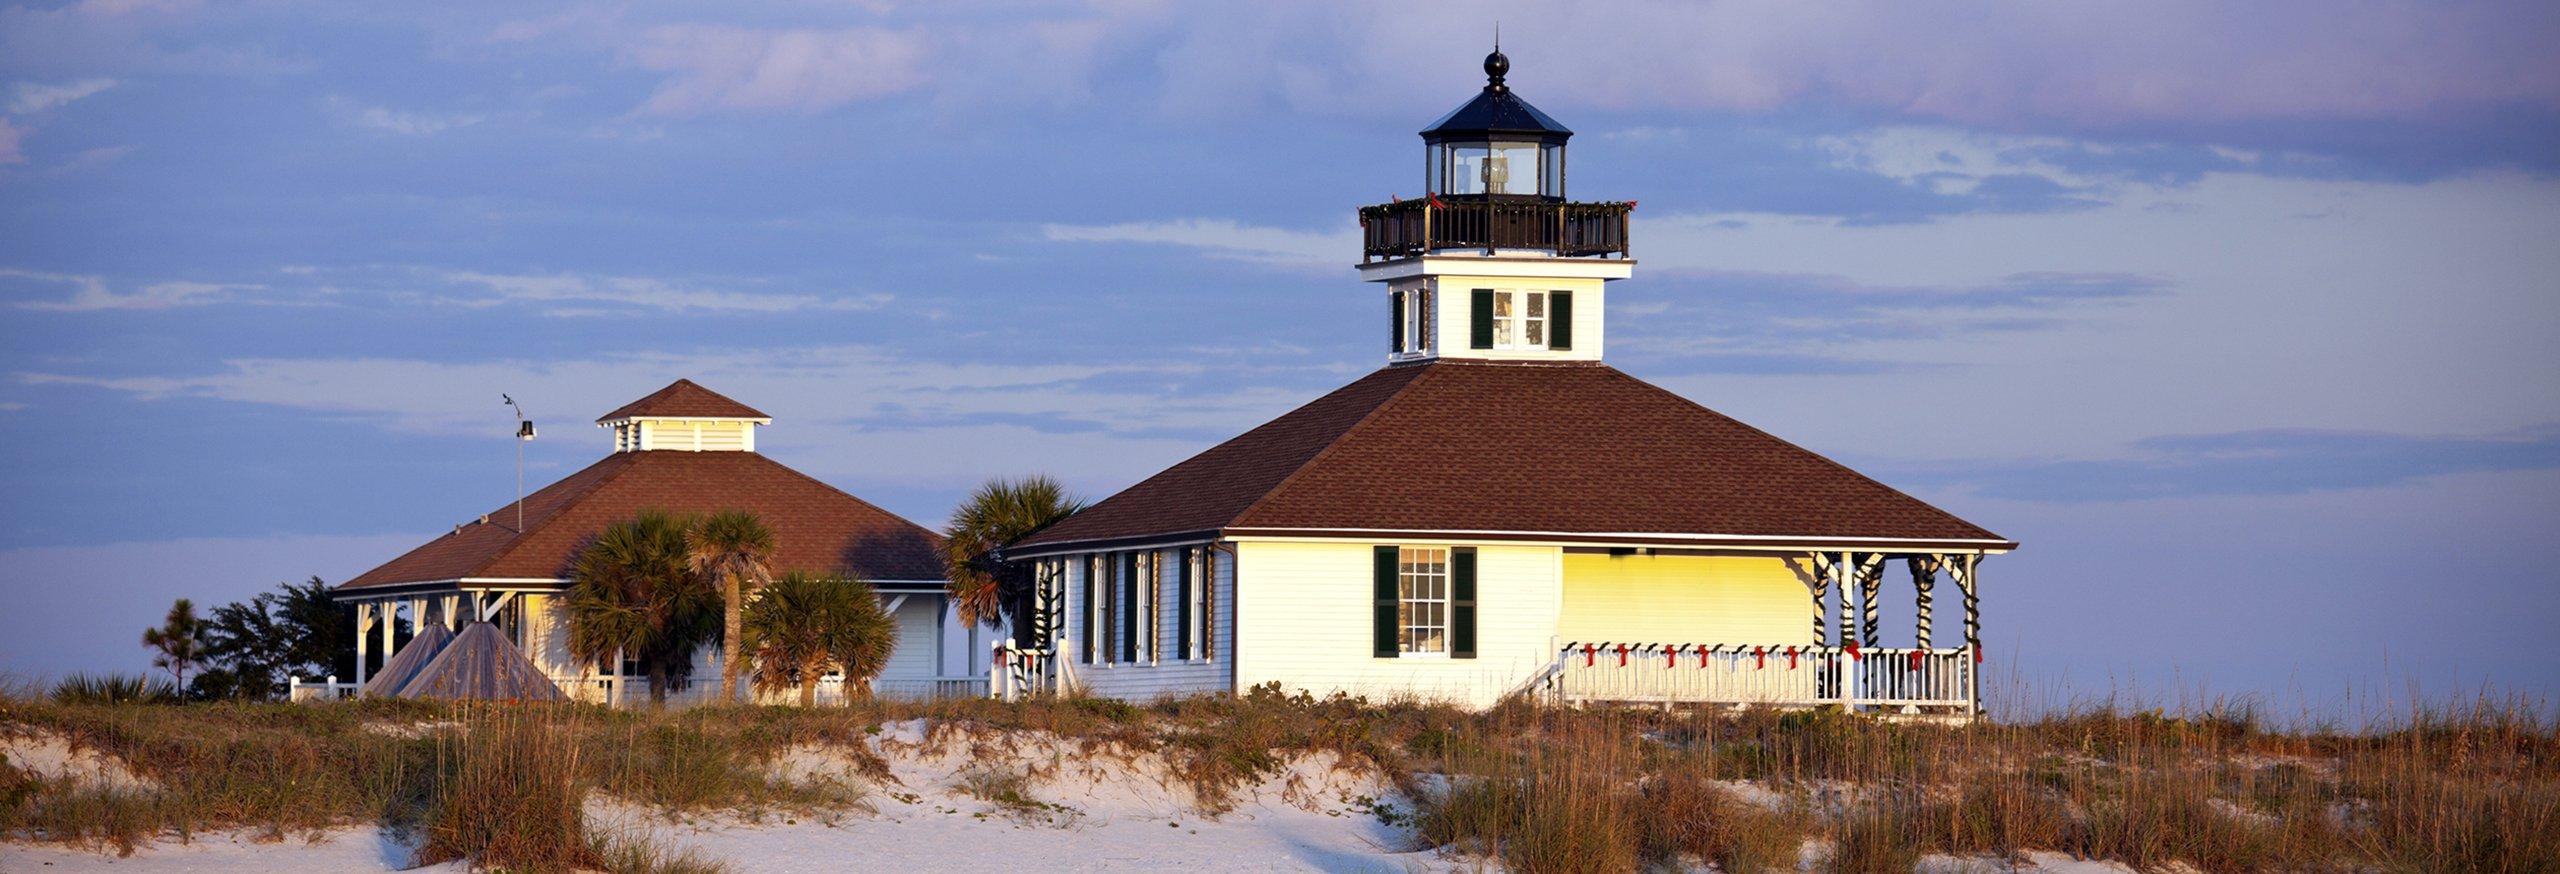 Lighthouse, Boca Grande, FL